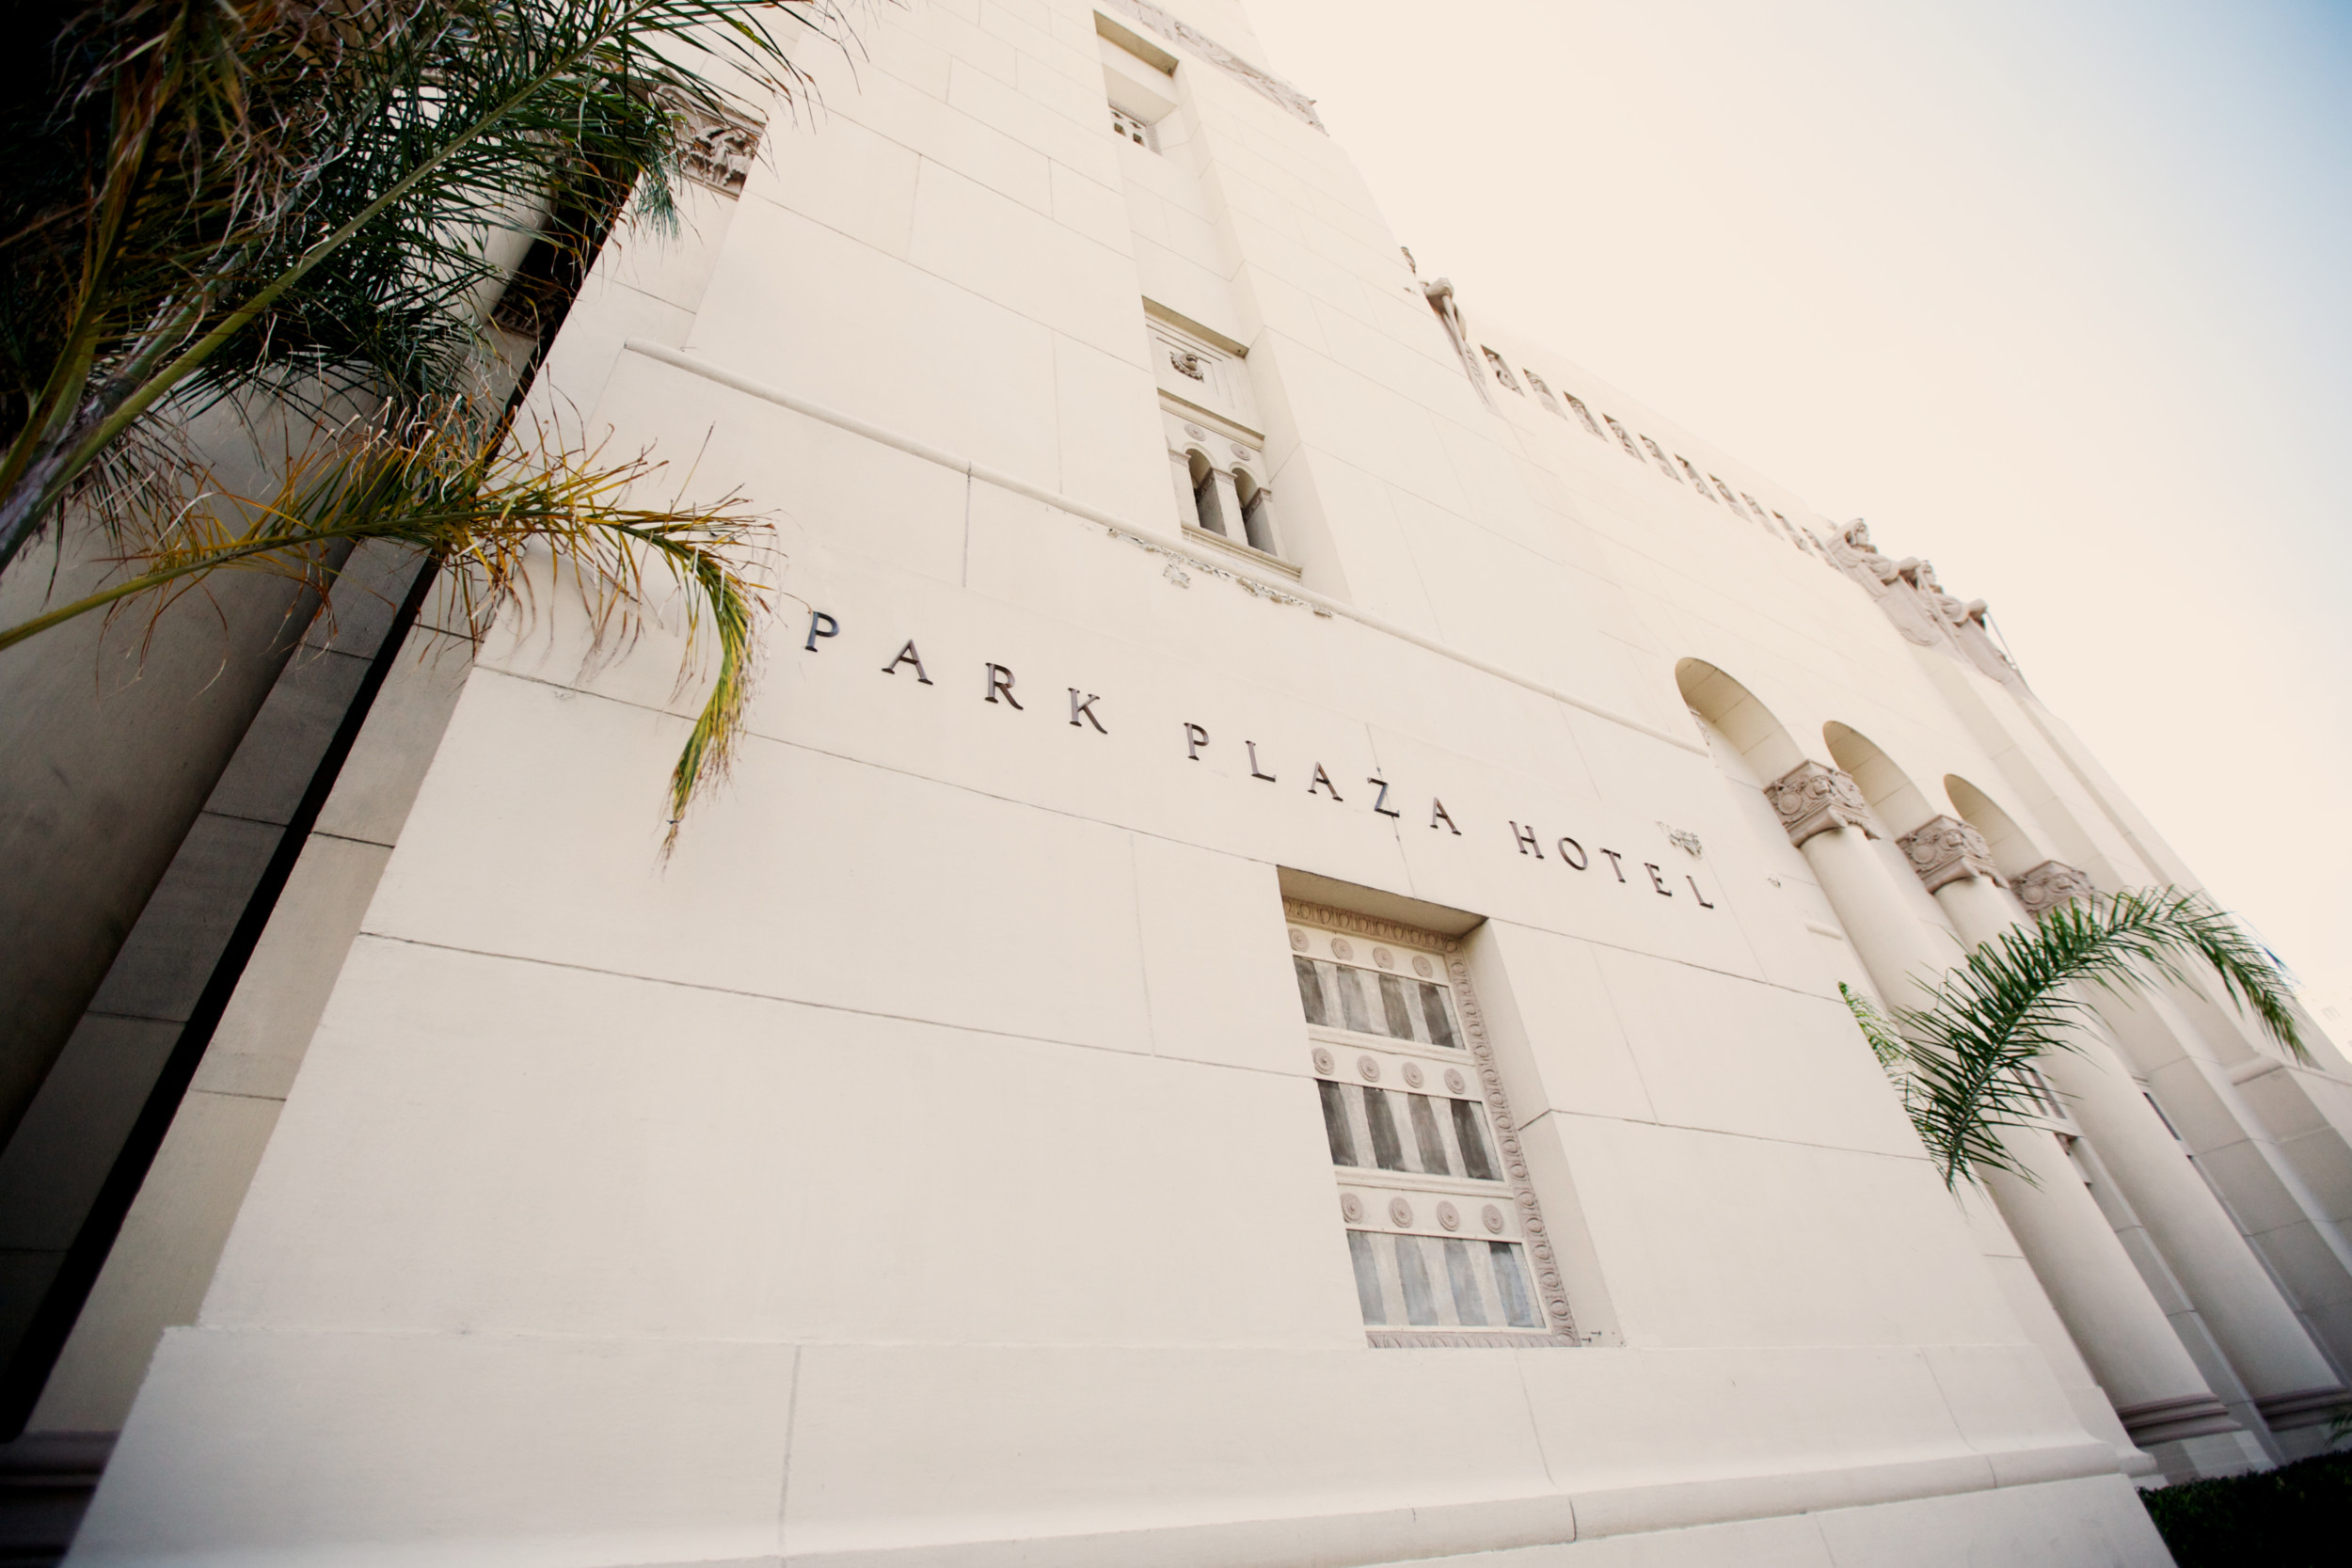 Park Plaza Hotel Wedding